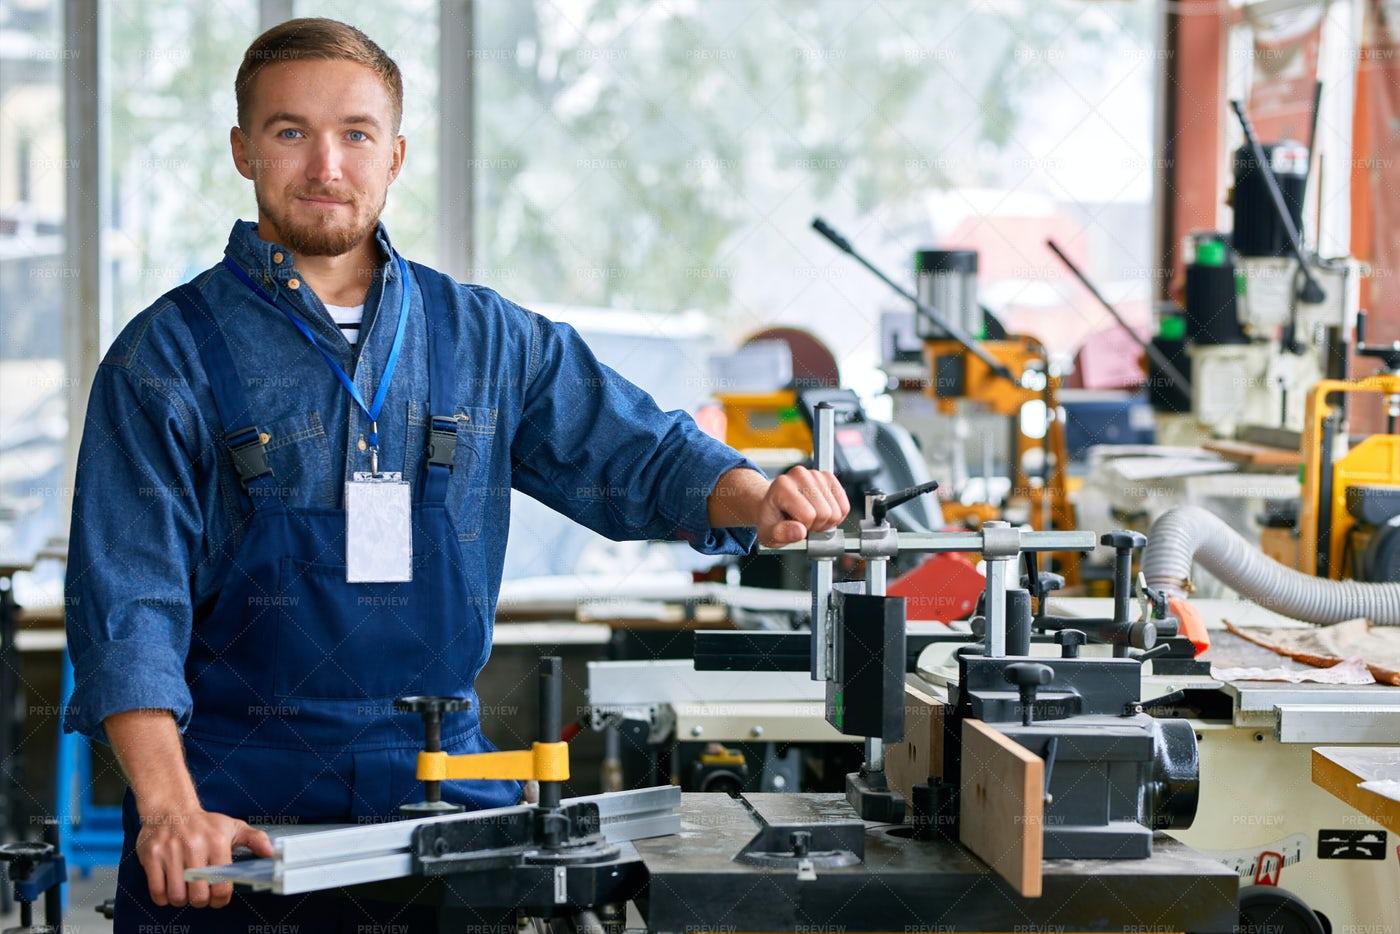 Workman Poising In Machine Units...: Stock Photos